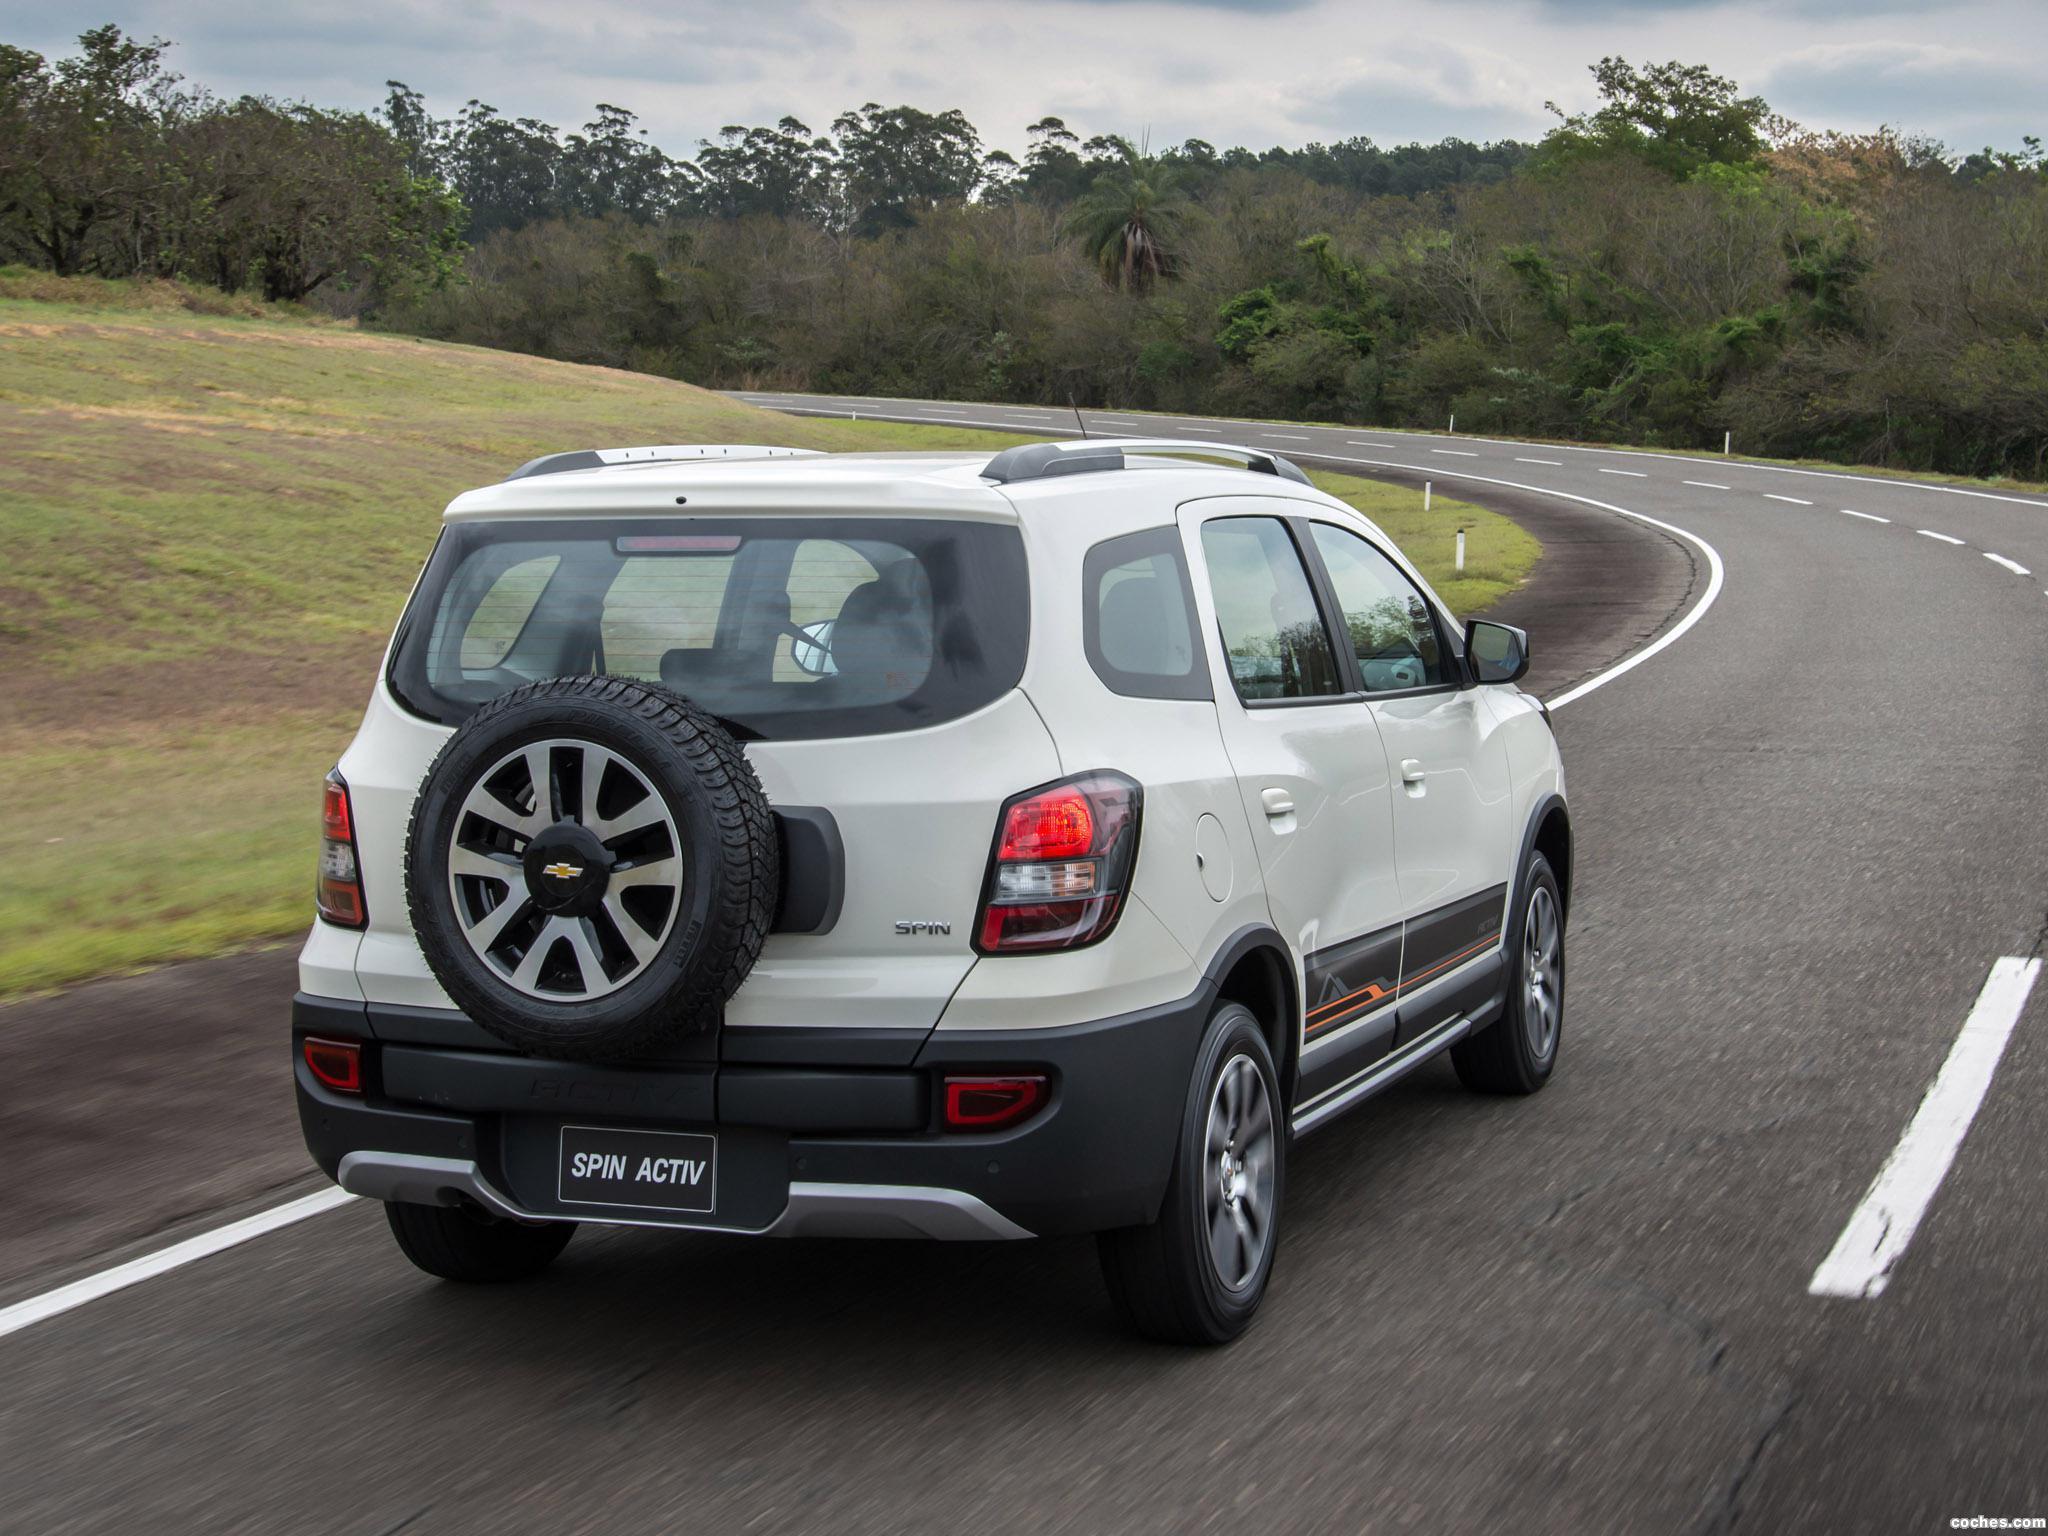 Foto 2 de Chevrolet Spin Activ 2014